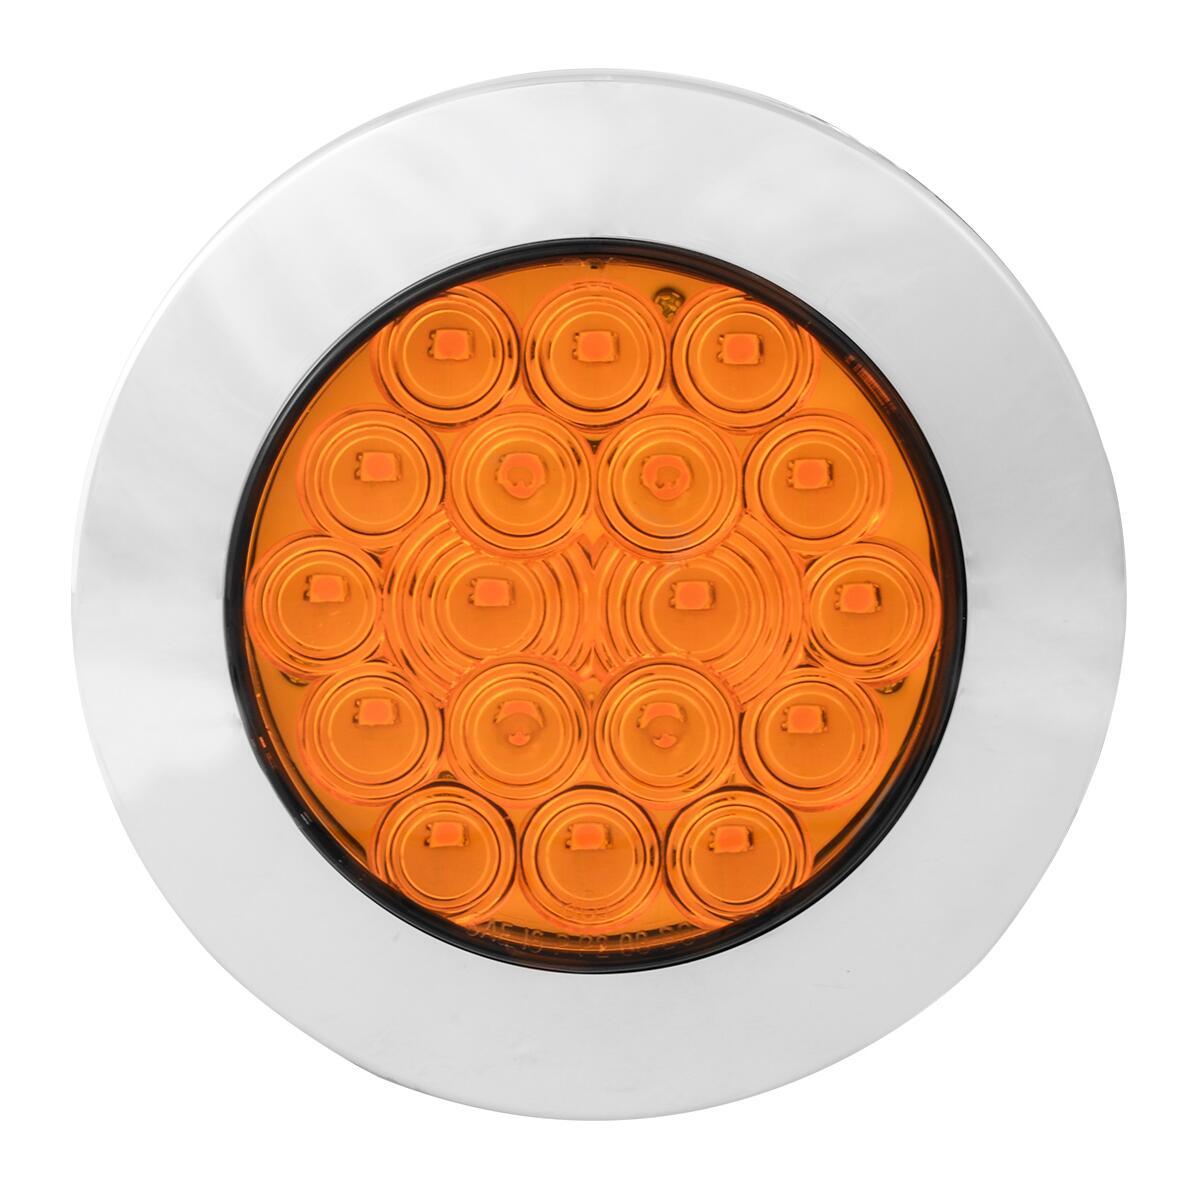 "75900 Amber/Amber 4"" Fleet Flange Mount LED Light with Chrome Twist & Lock Bezel"